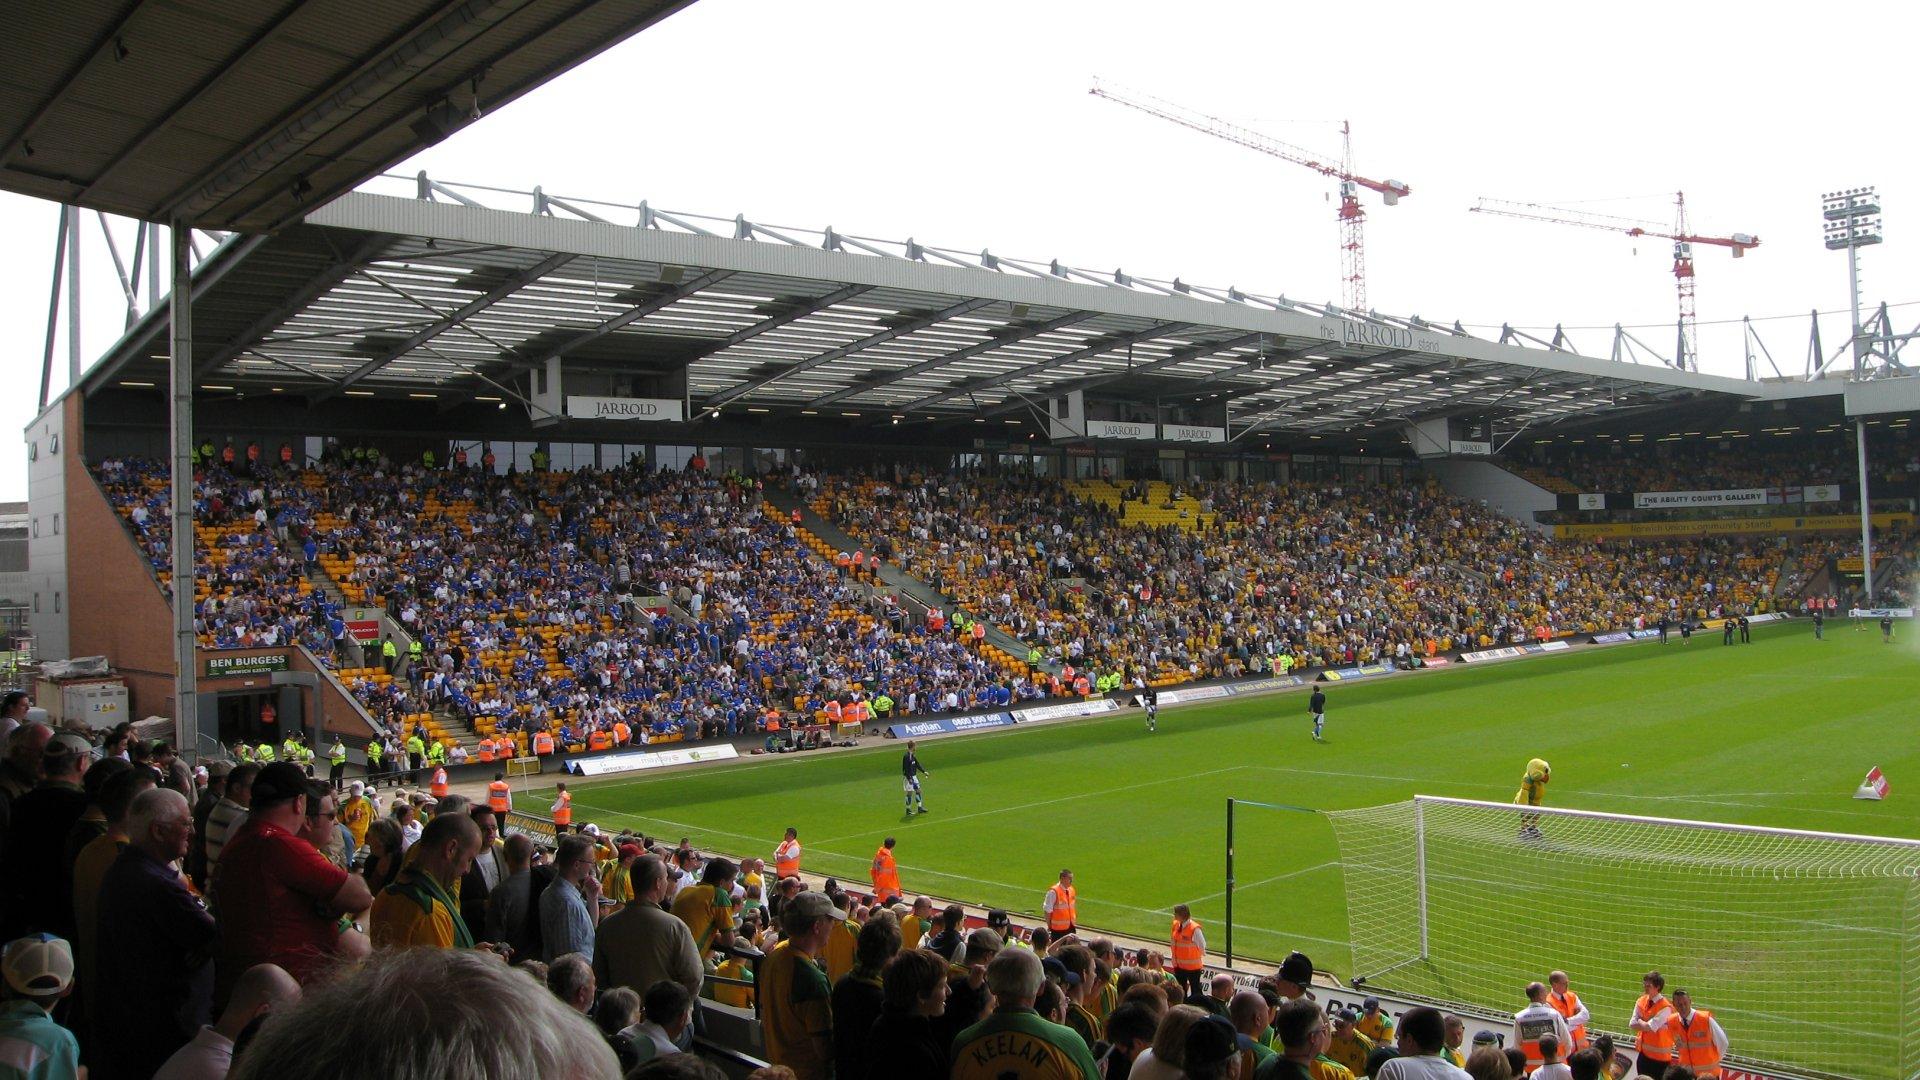 Norwich City F.C. (Football Club) Of The Barclay's Premier